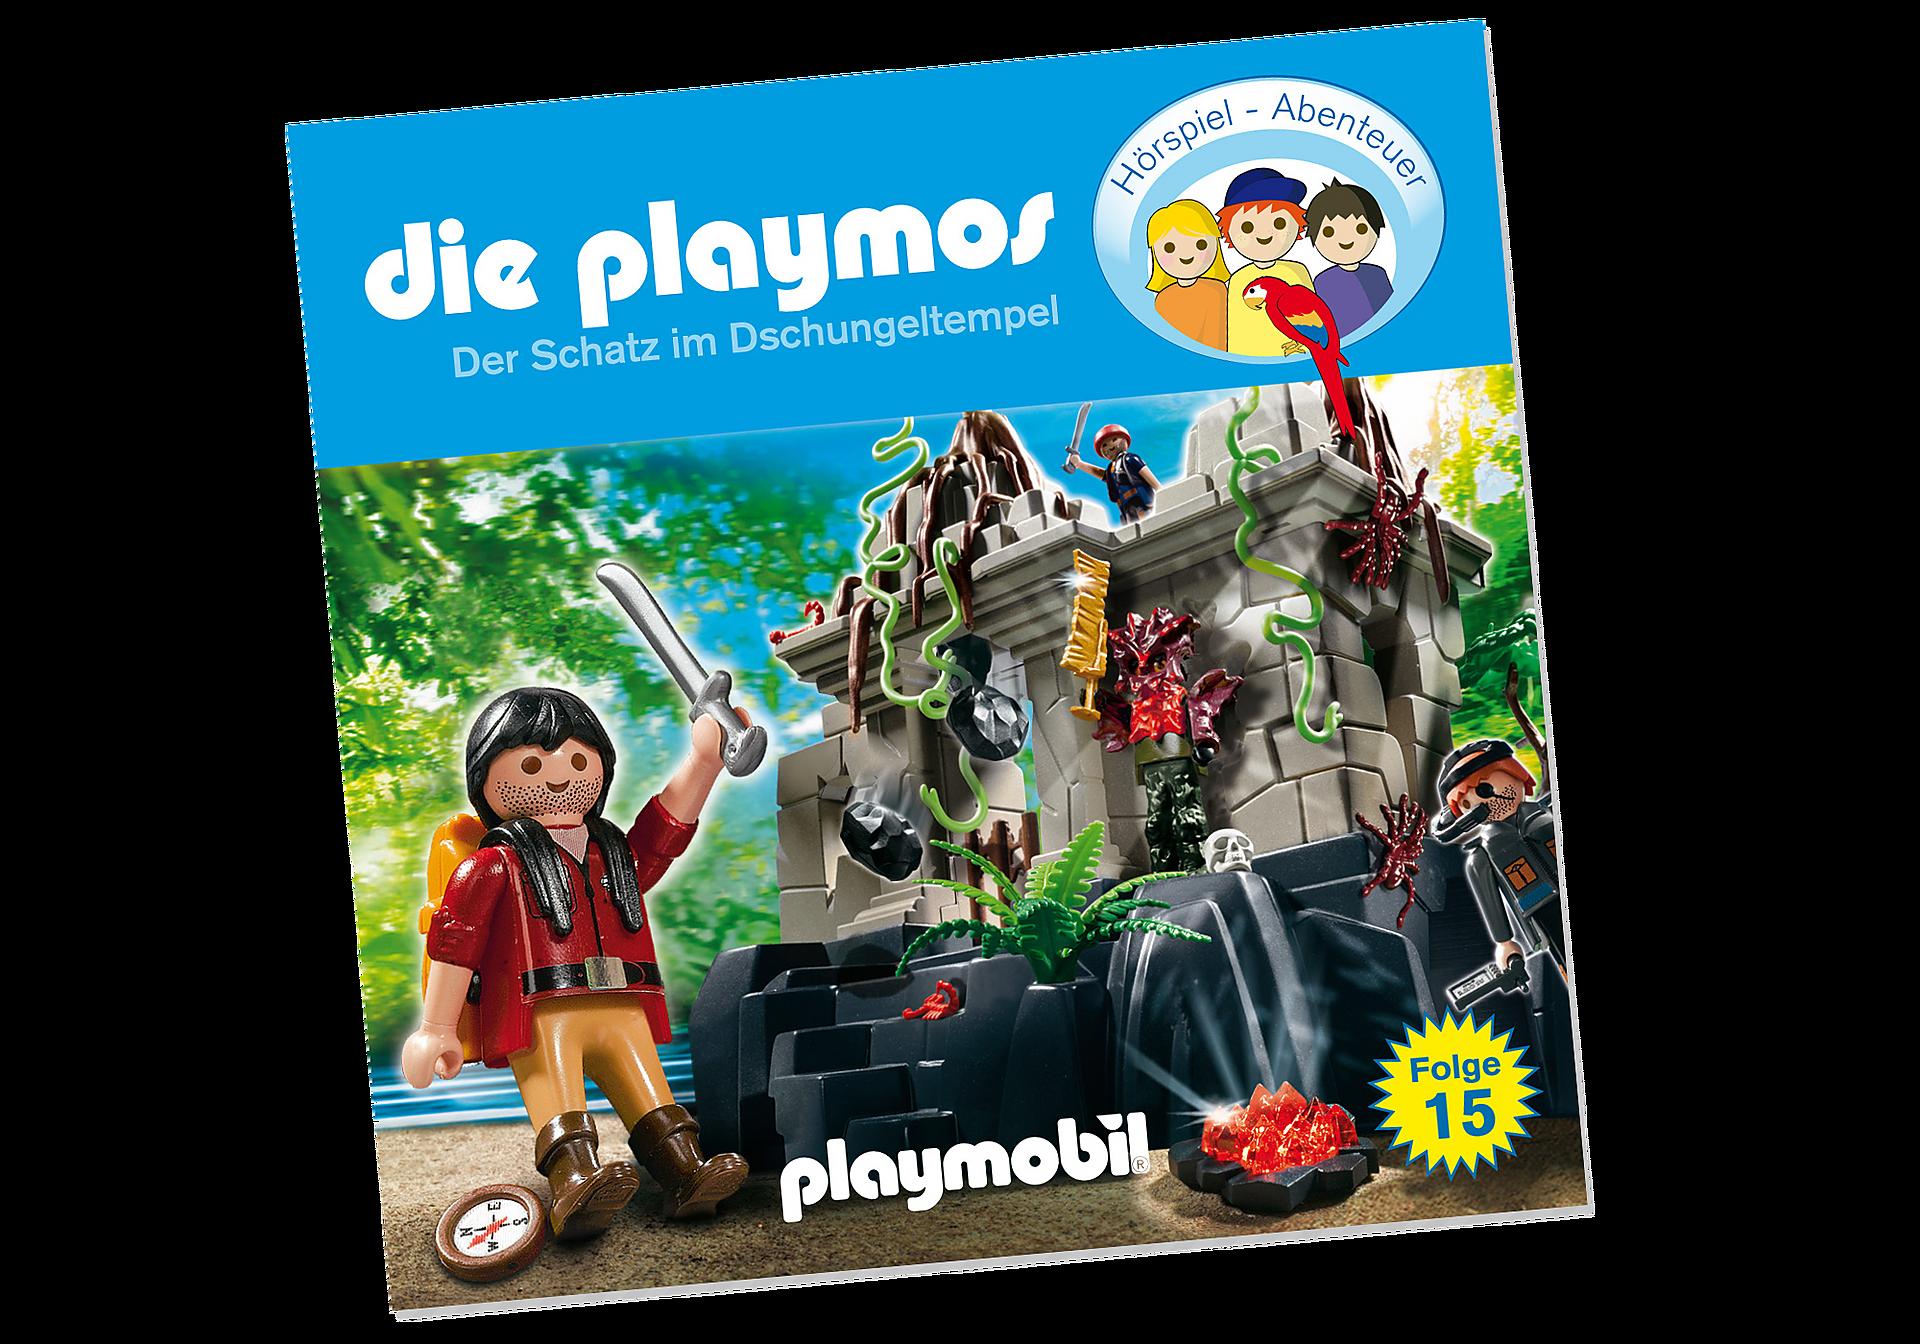 http://media.playmobil.com/i/playmobil/80260_product_detail/Der Schatz im Dschungeltempel (15) - CD